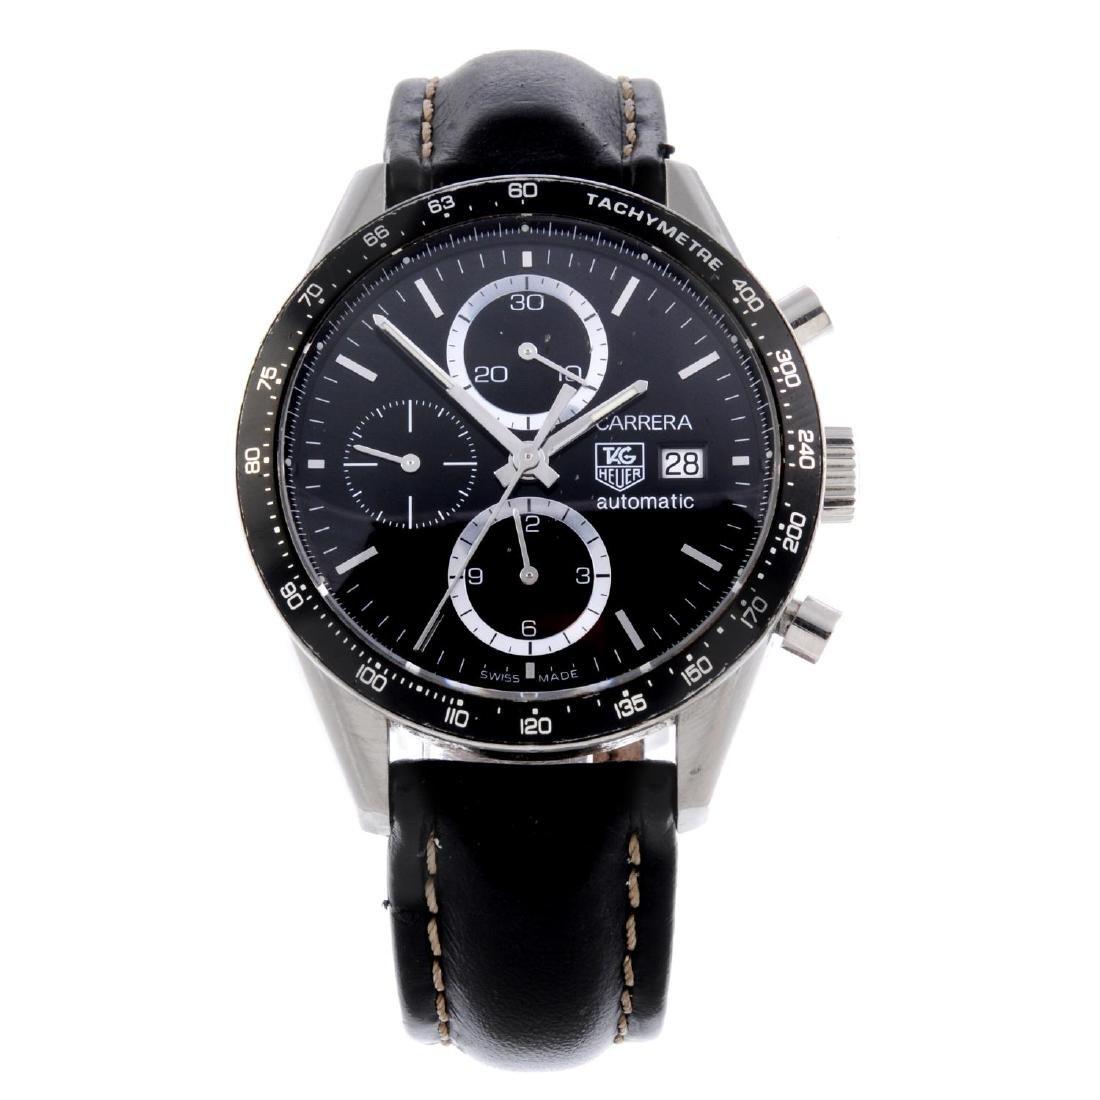 TAG HEUER - a gentleman's Carrera chronograph wrist